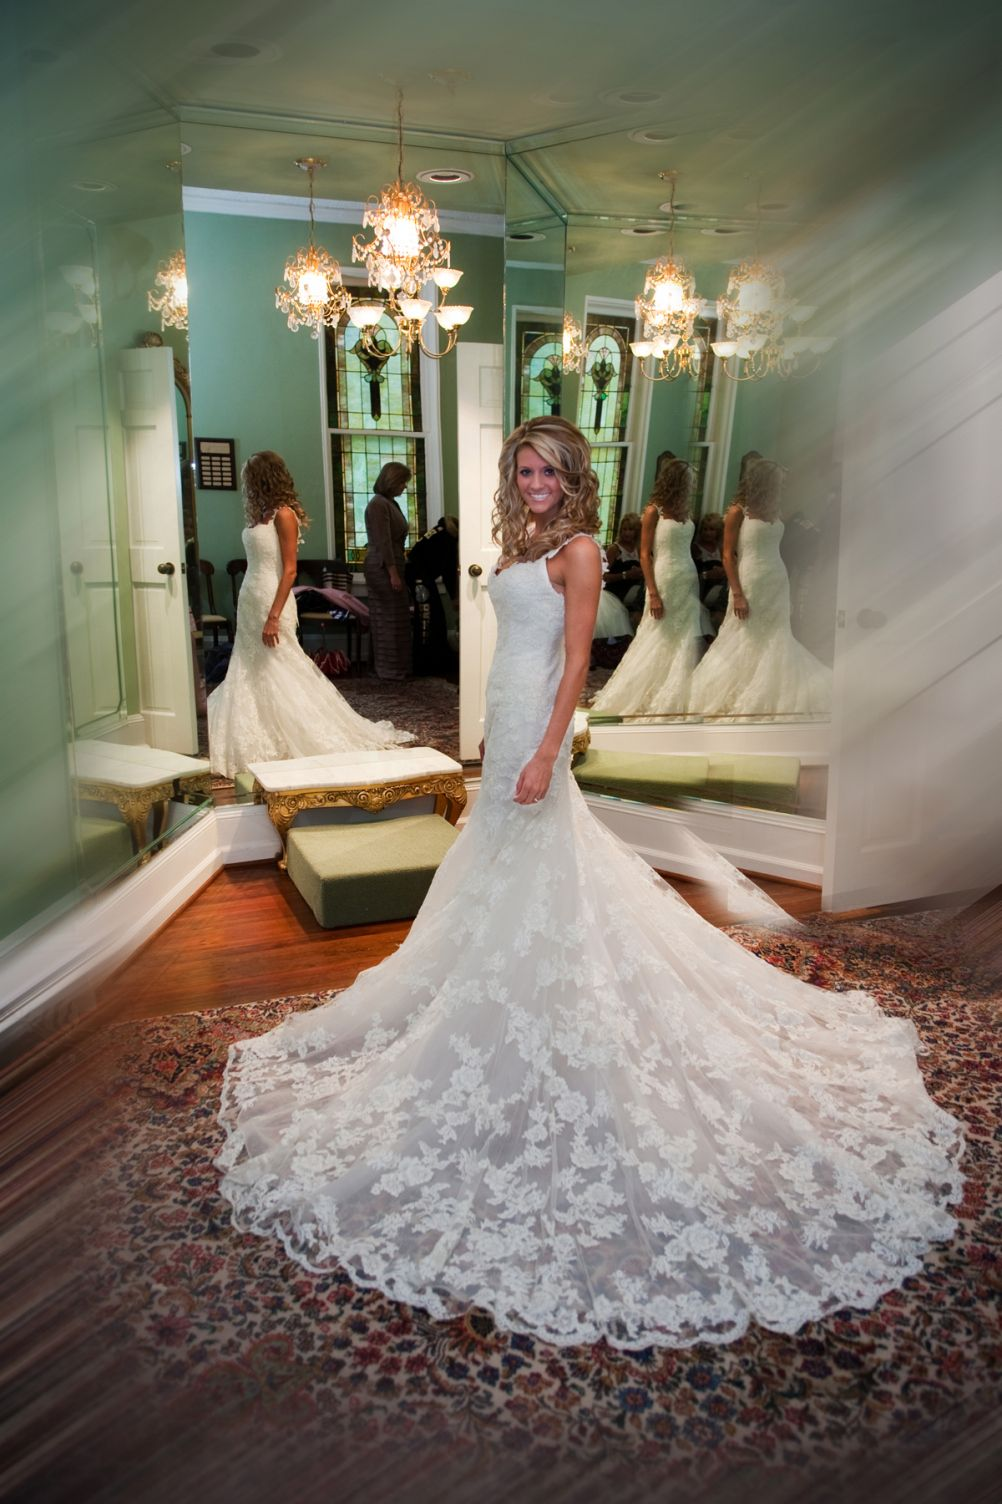 wedding dress birmingham al   deweddingjpg.com